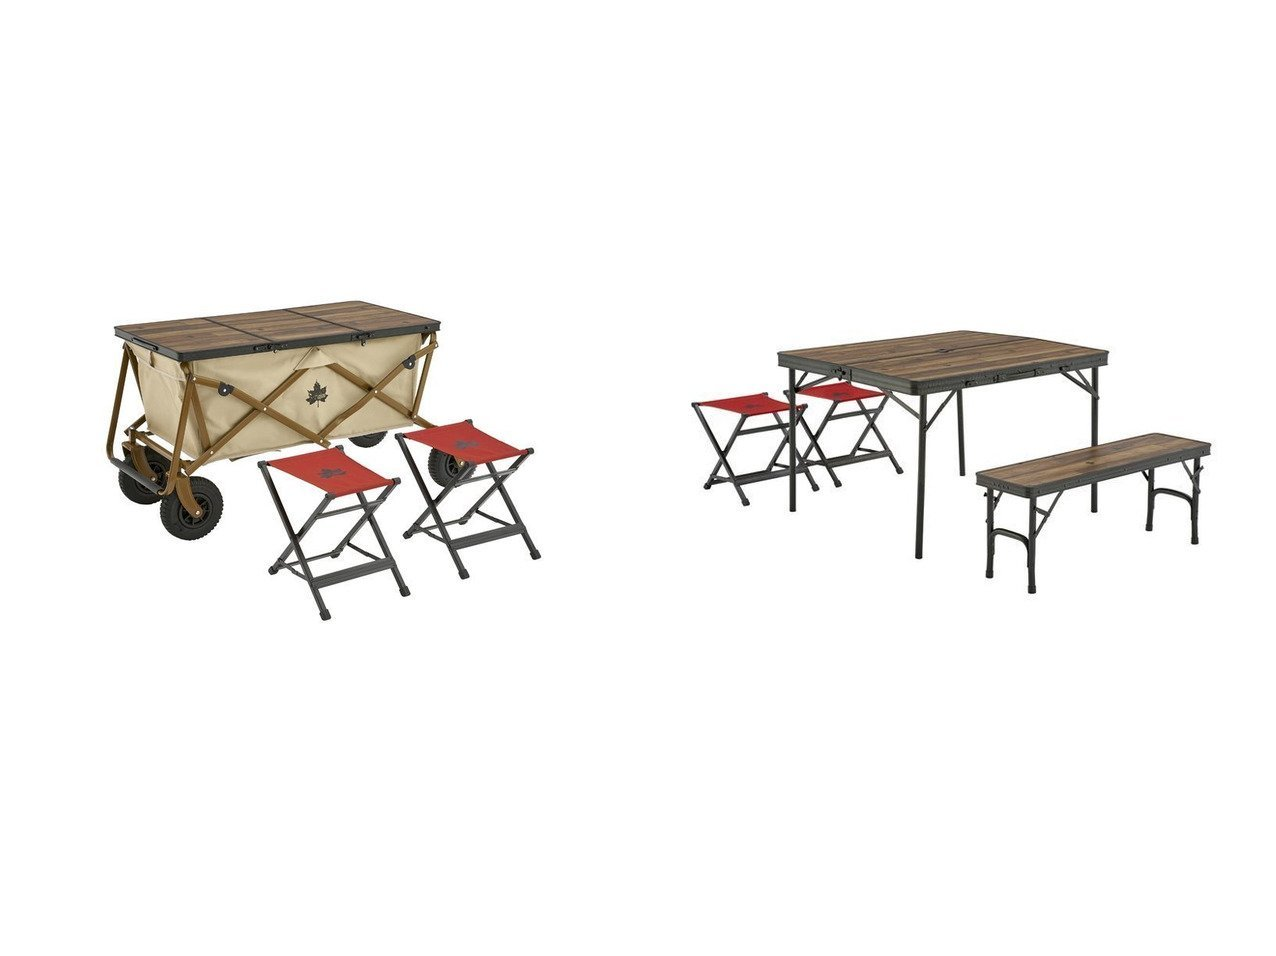 【LOGOS/ロゴス】のTracksleeper 3FDカートオンテーブルチェアセット2&Tracksleeper ベンチ チェアテーブルセット4 【アウトドアテーブル】おすすめ!人気キャンプ・アウトドア用品の通販 おすすめで人気の流行・トレンド、ファッションの通販商品 インテリア・家具・メンズファッション・キッズファッション・レディースファッション・服の通販 founy(ファニー) https://founy.com/ アウトドア コーティング スタンド テーブル フレーム プリント ホーム・キャンプ・アウトドア Home,Garden,Outdoor,Camping Gear キャンプ用品・アウトドア  Camping Gear & Outdoor Supplies チェア テーブル Camp Chairs, Camping Tables |ID:crp329100000050847